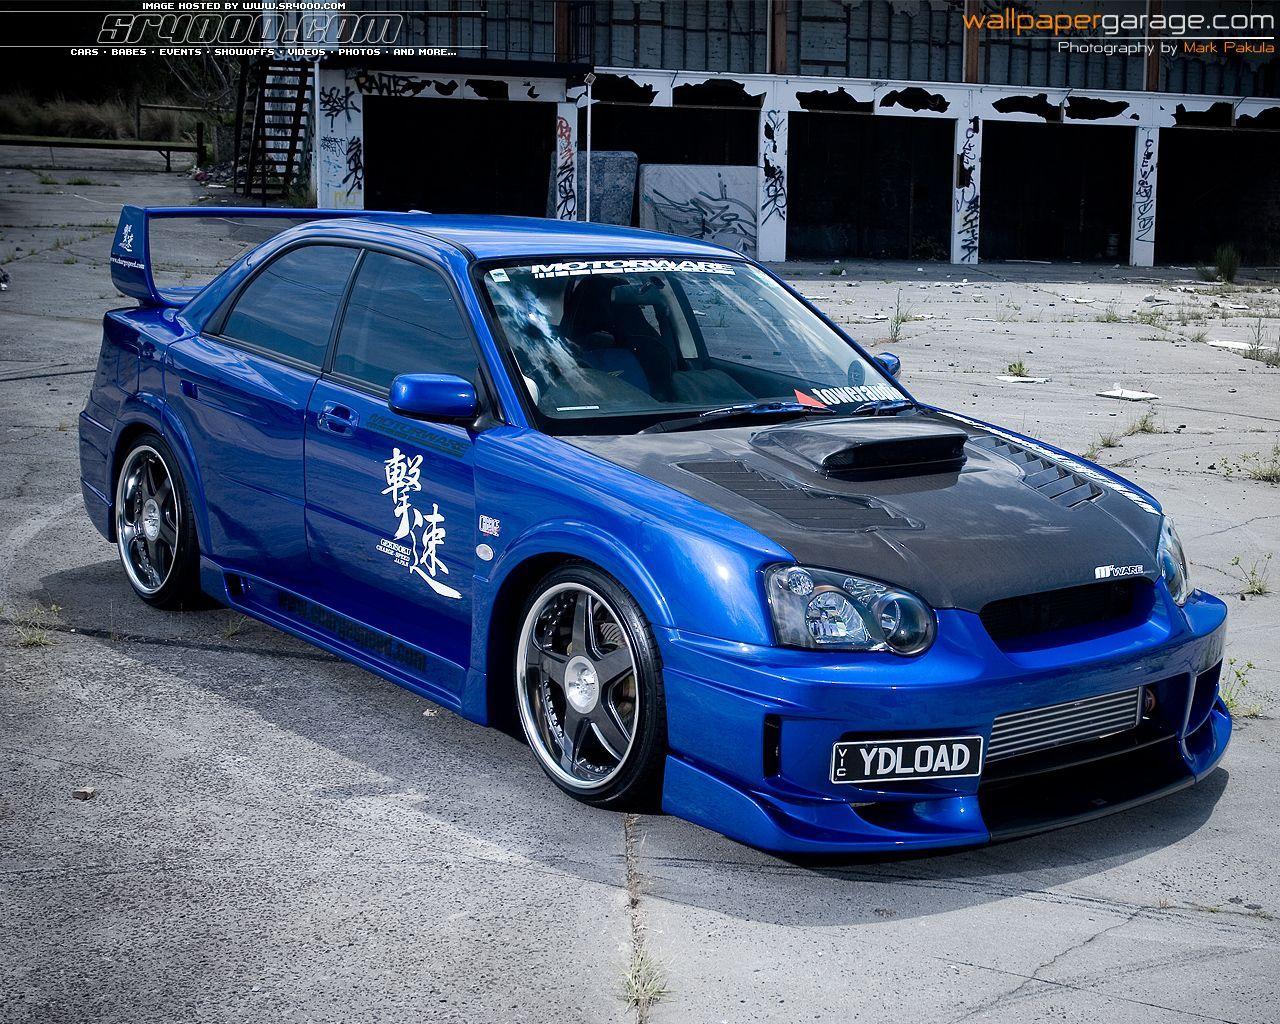 Awesome Impreza Blobeye (2G)   Custom Impreza Blobeye   Tuning Cars Photo # Subaru